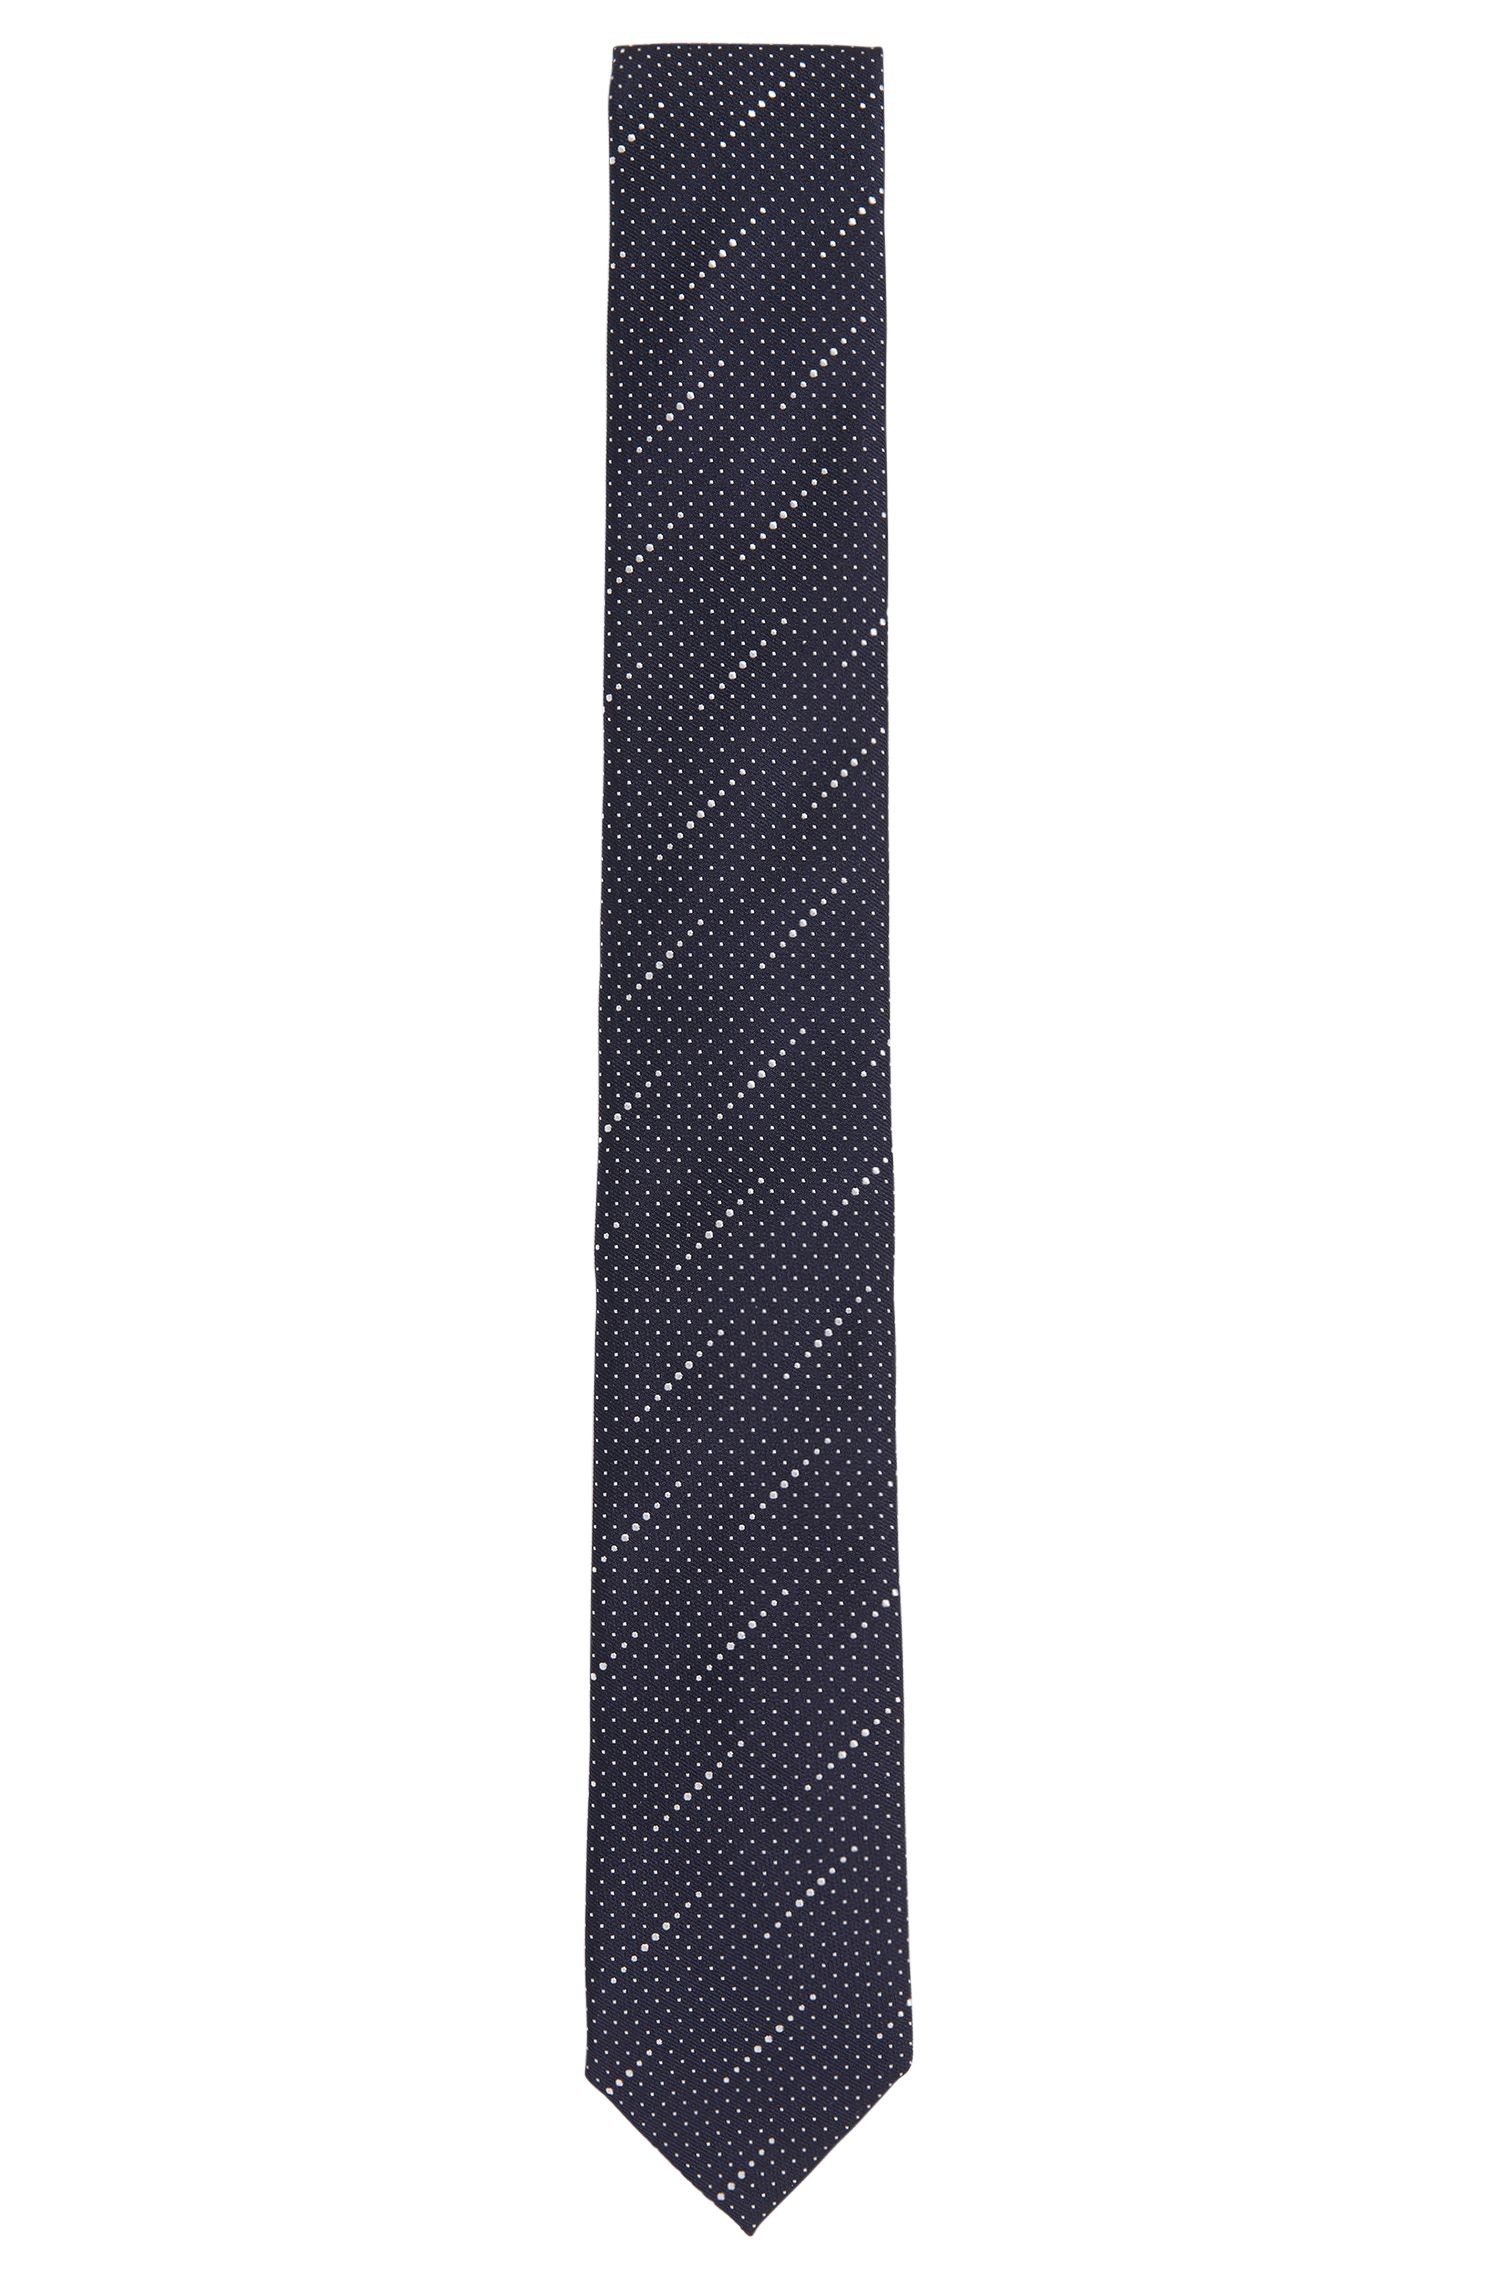 'Tie 6 cm' | Slim, Silk Dot Weave Tie